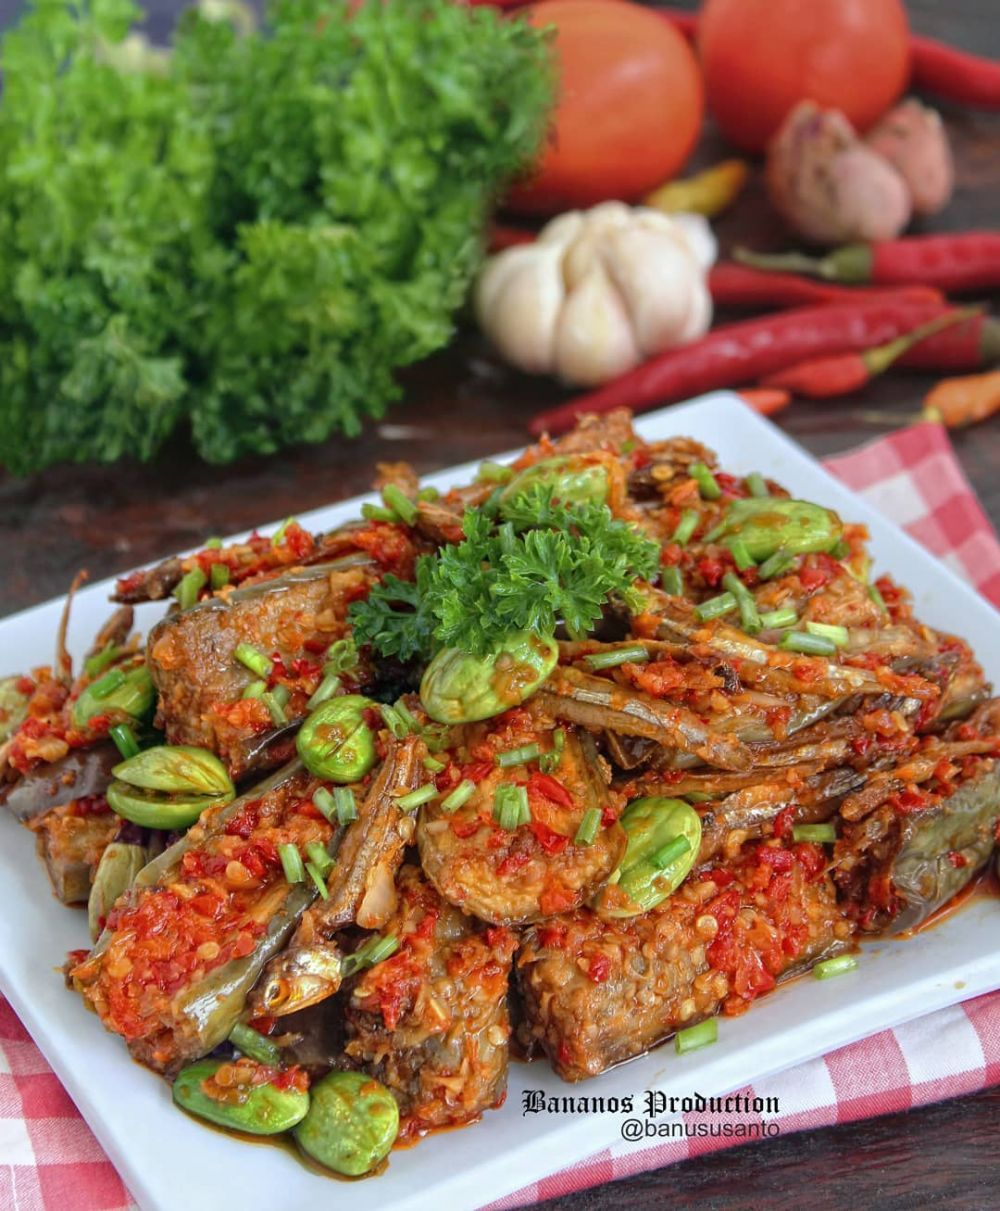 25 Resep Balado Paling Enak Istimewa Di 2020 Resep Masakan Simpel Resep Masakan